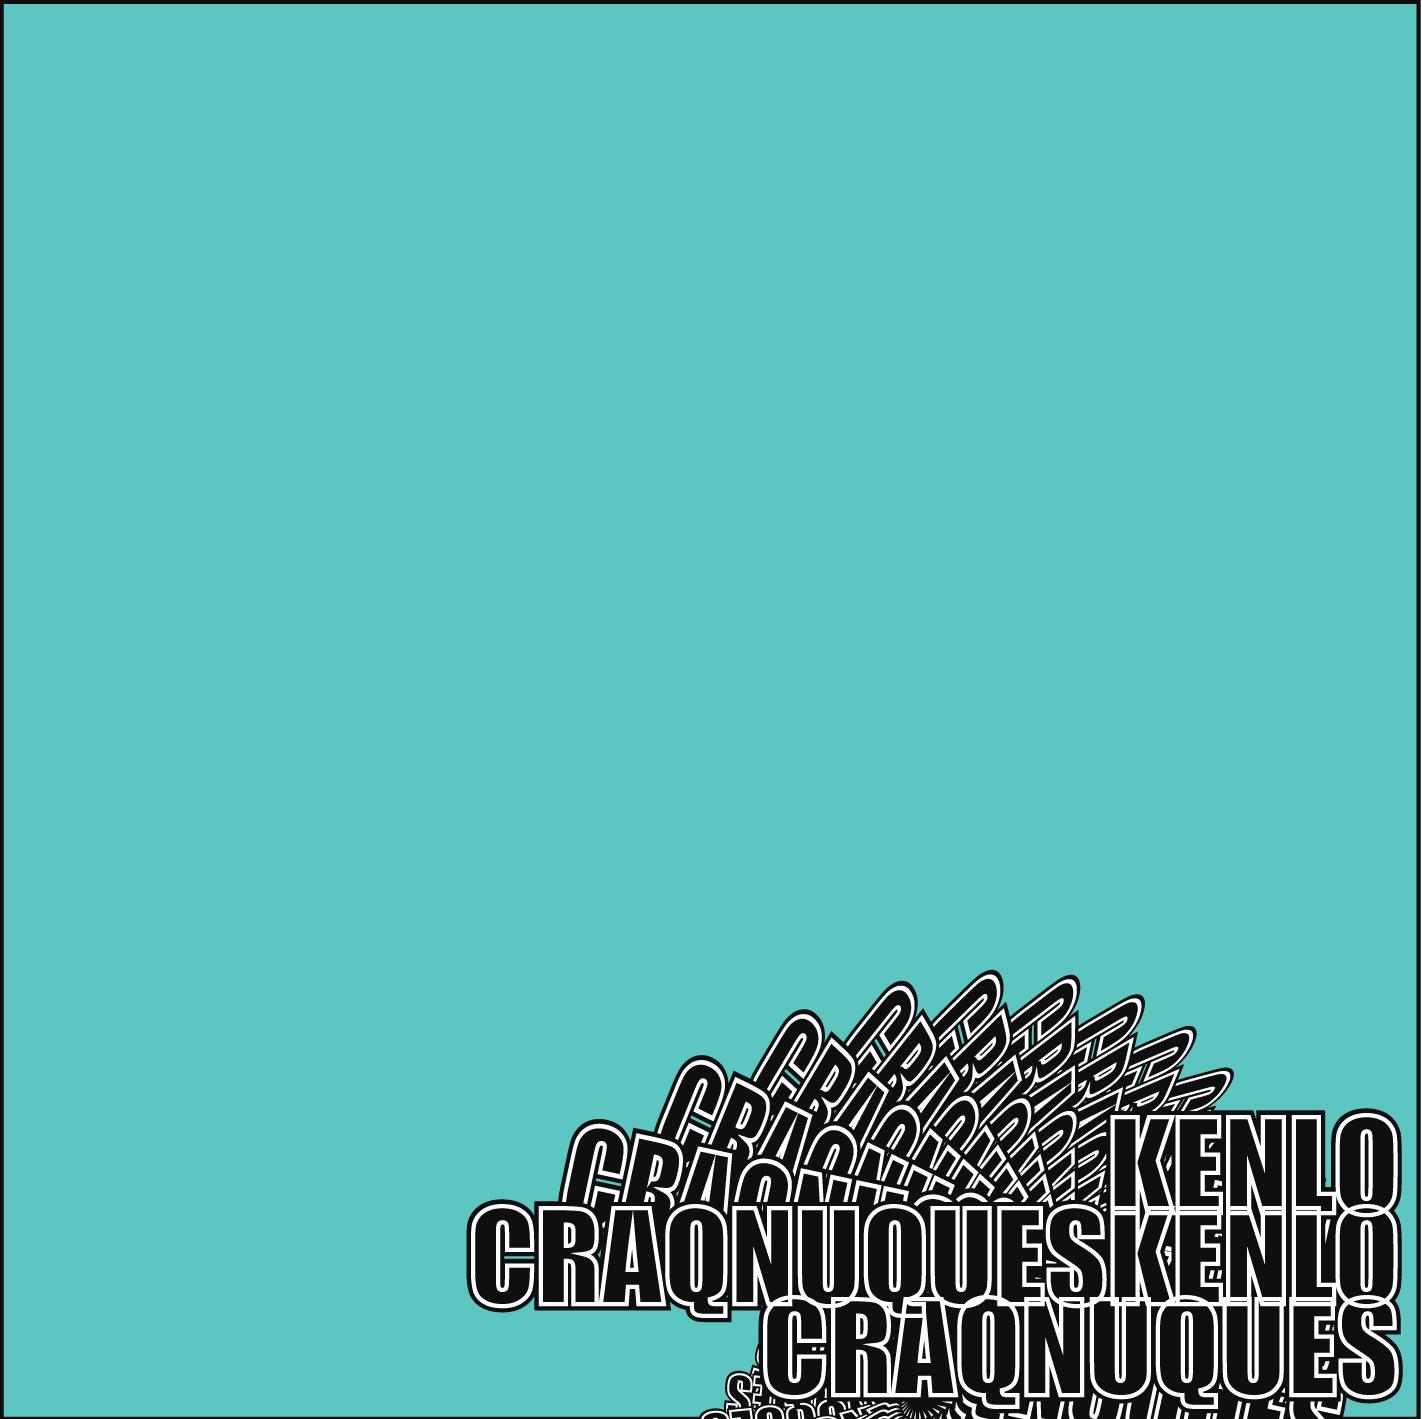 KENLO CRAQNUQUE master 01